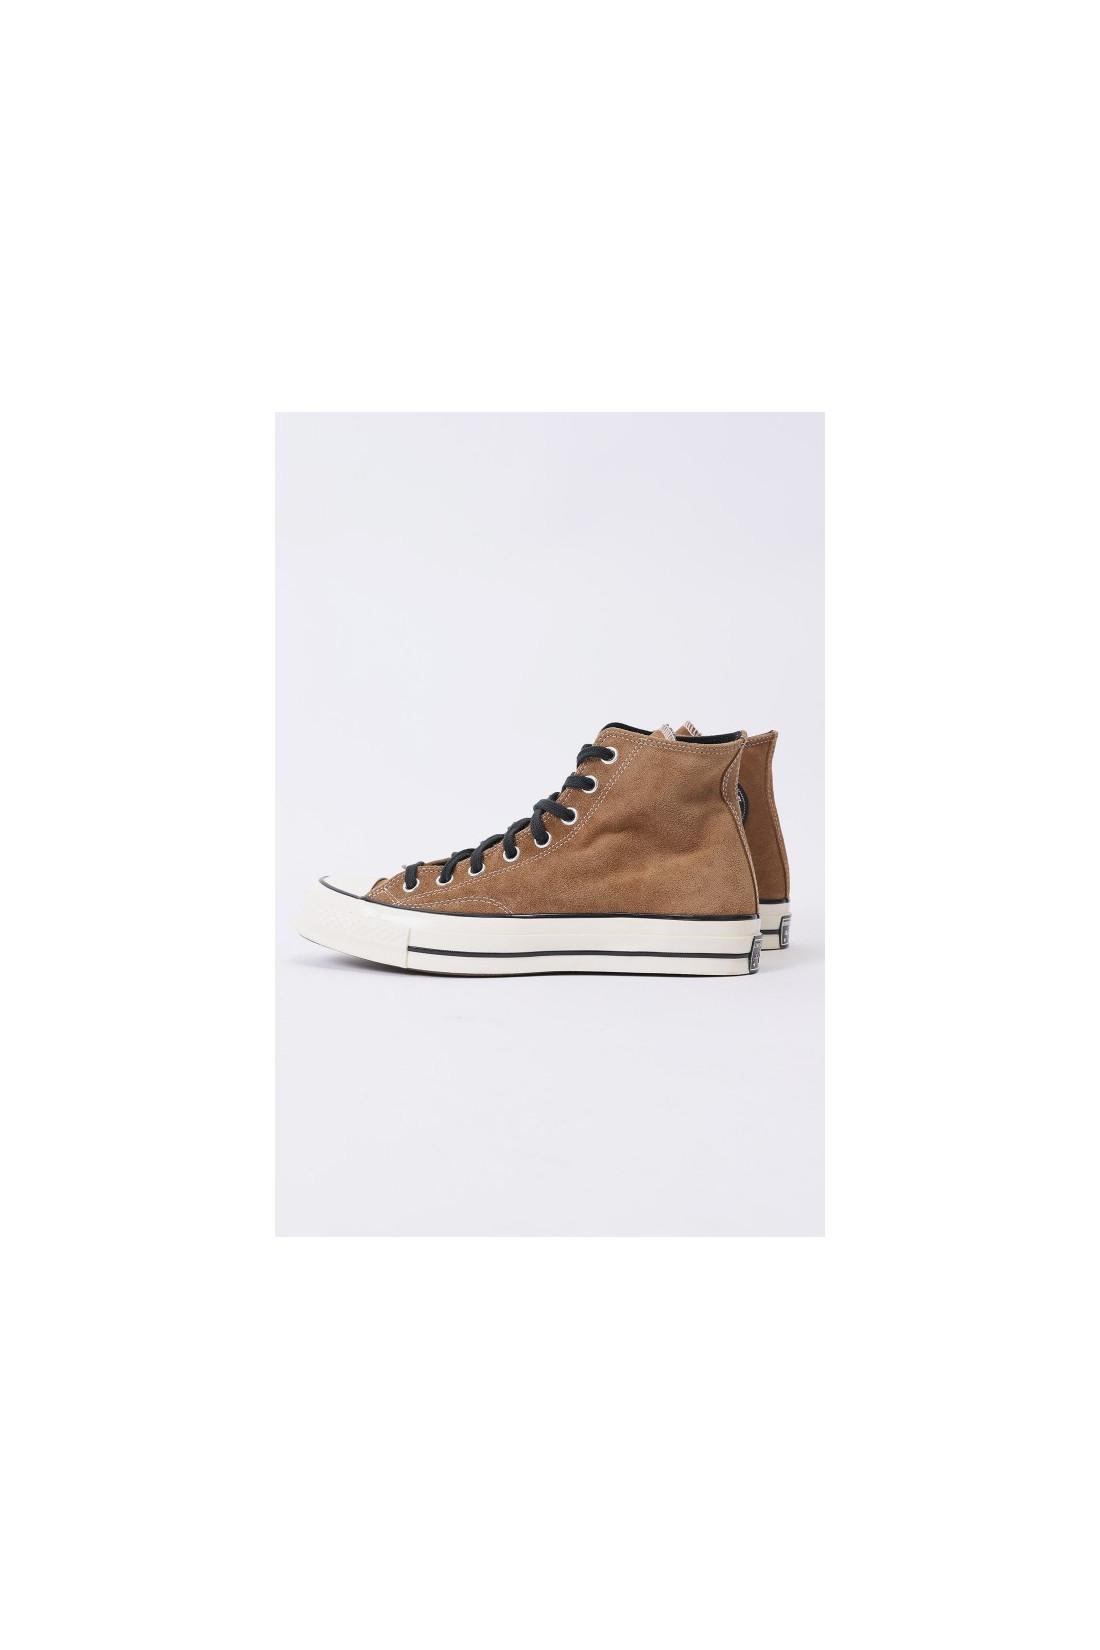 CONVERSE / Ctas 70's hi suede leather Black clove brown